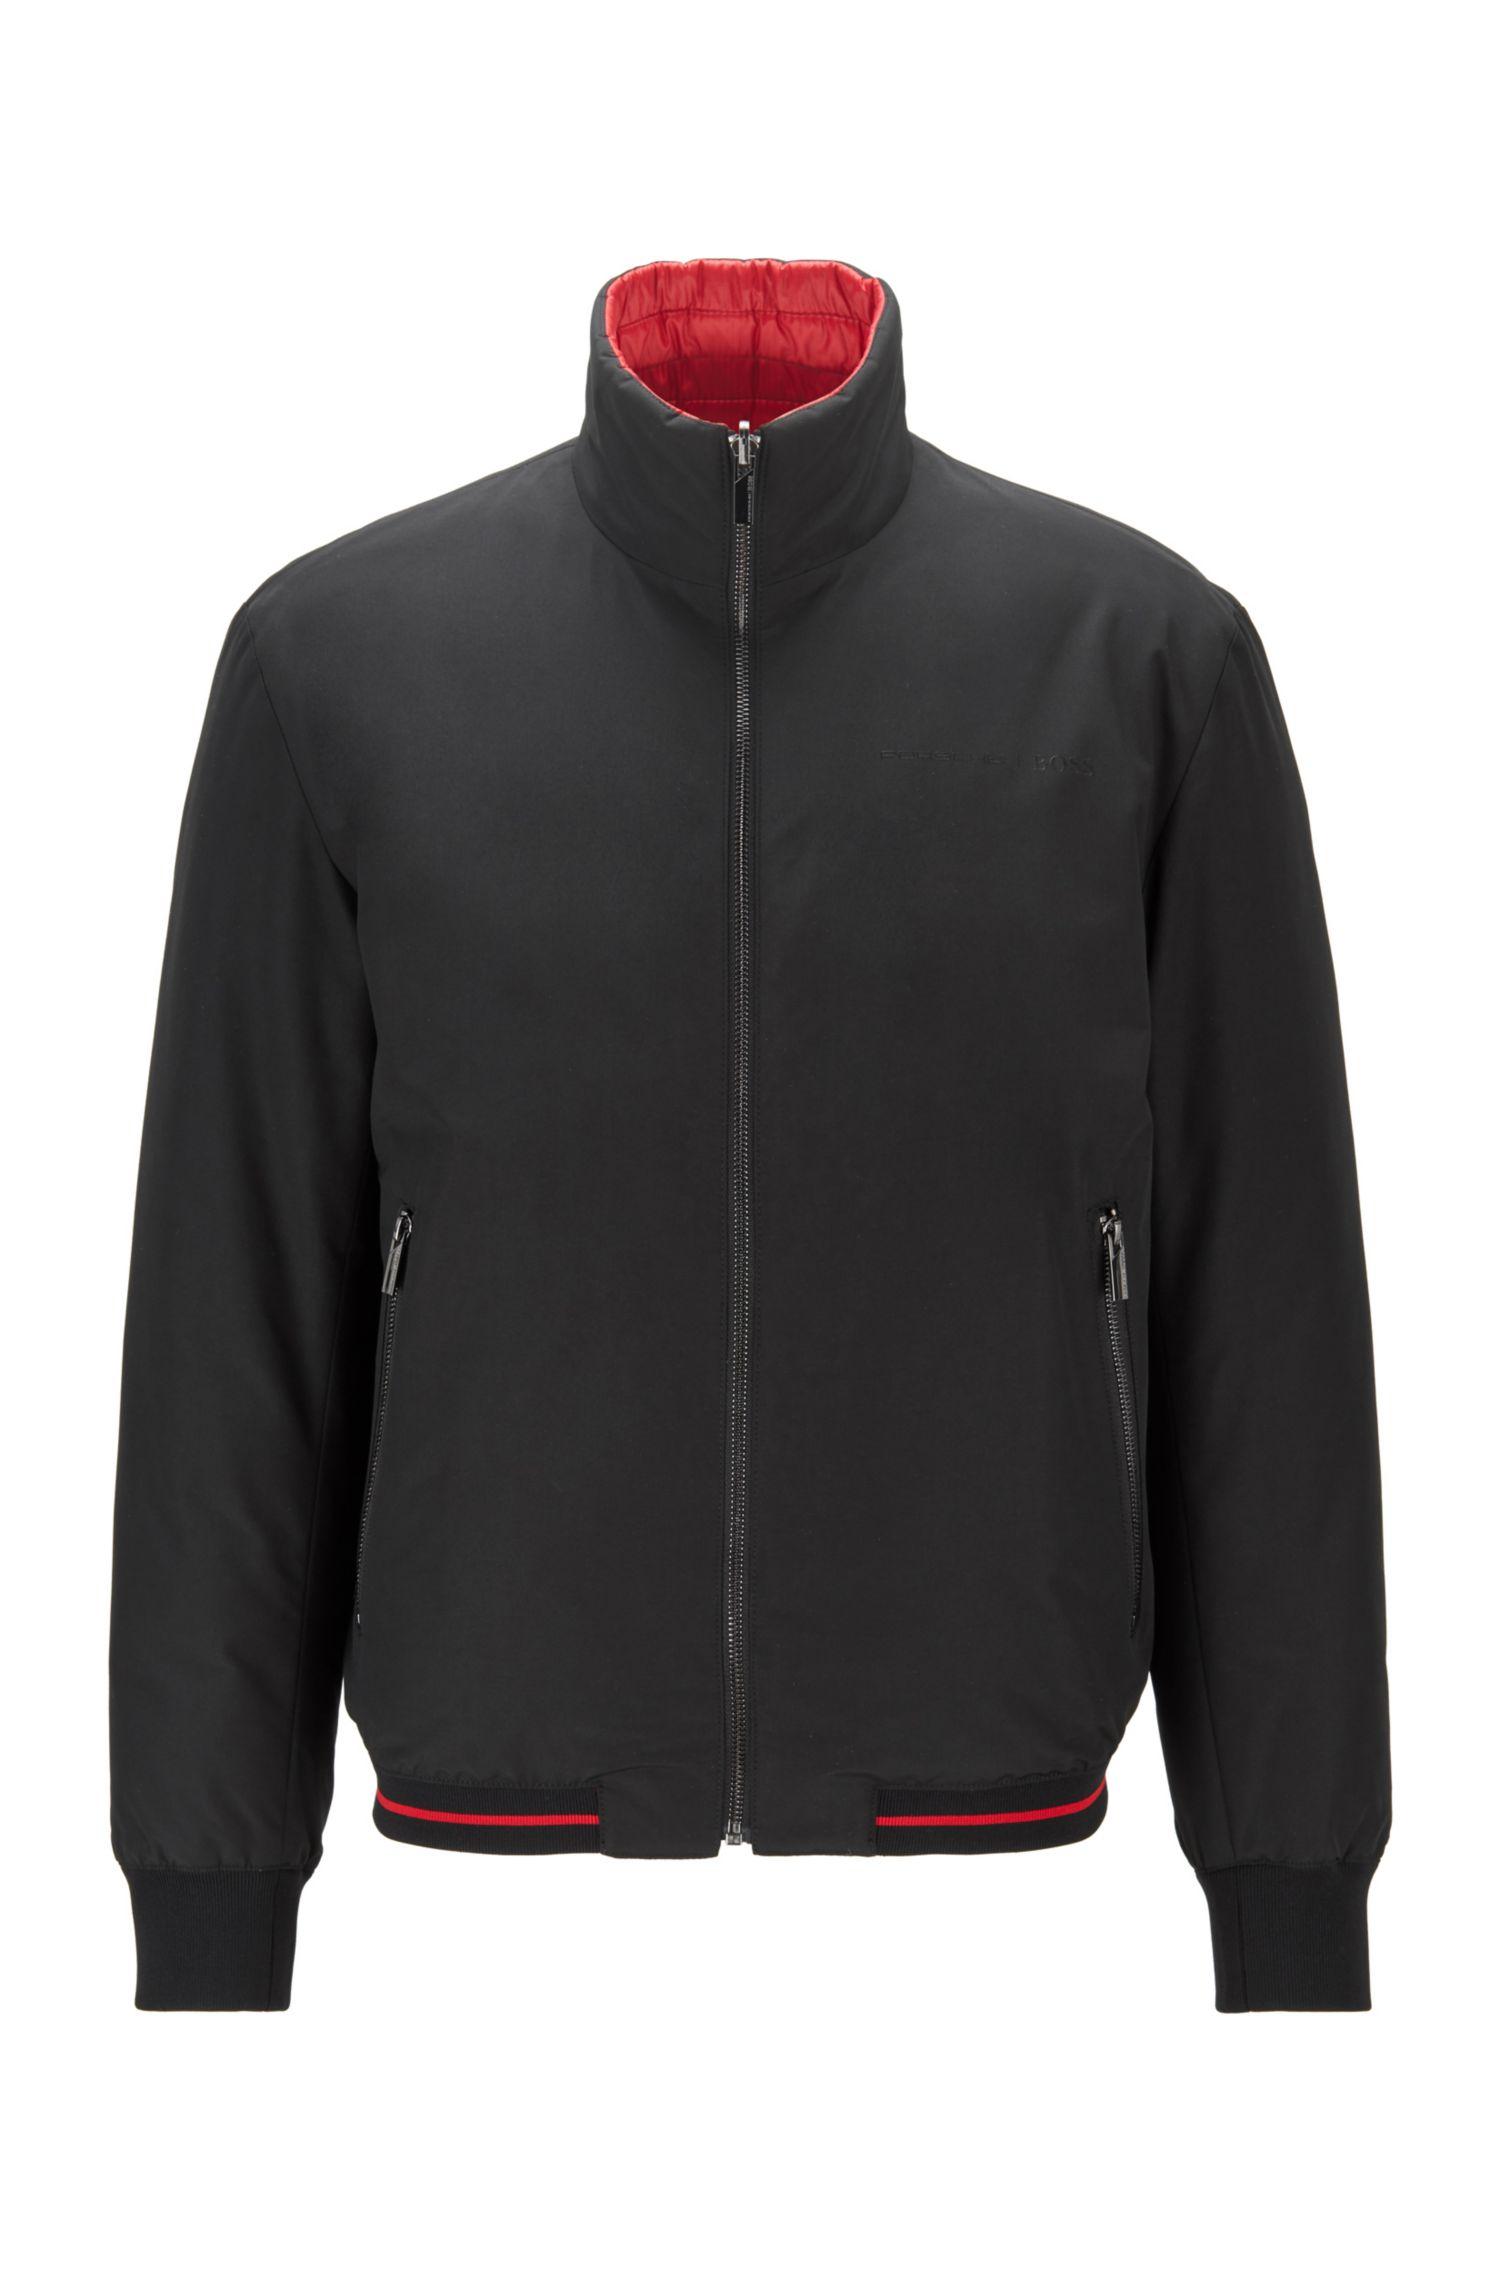 Reversible jacket with black zip pockets BOSS | Jackets | 50436703001